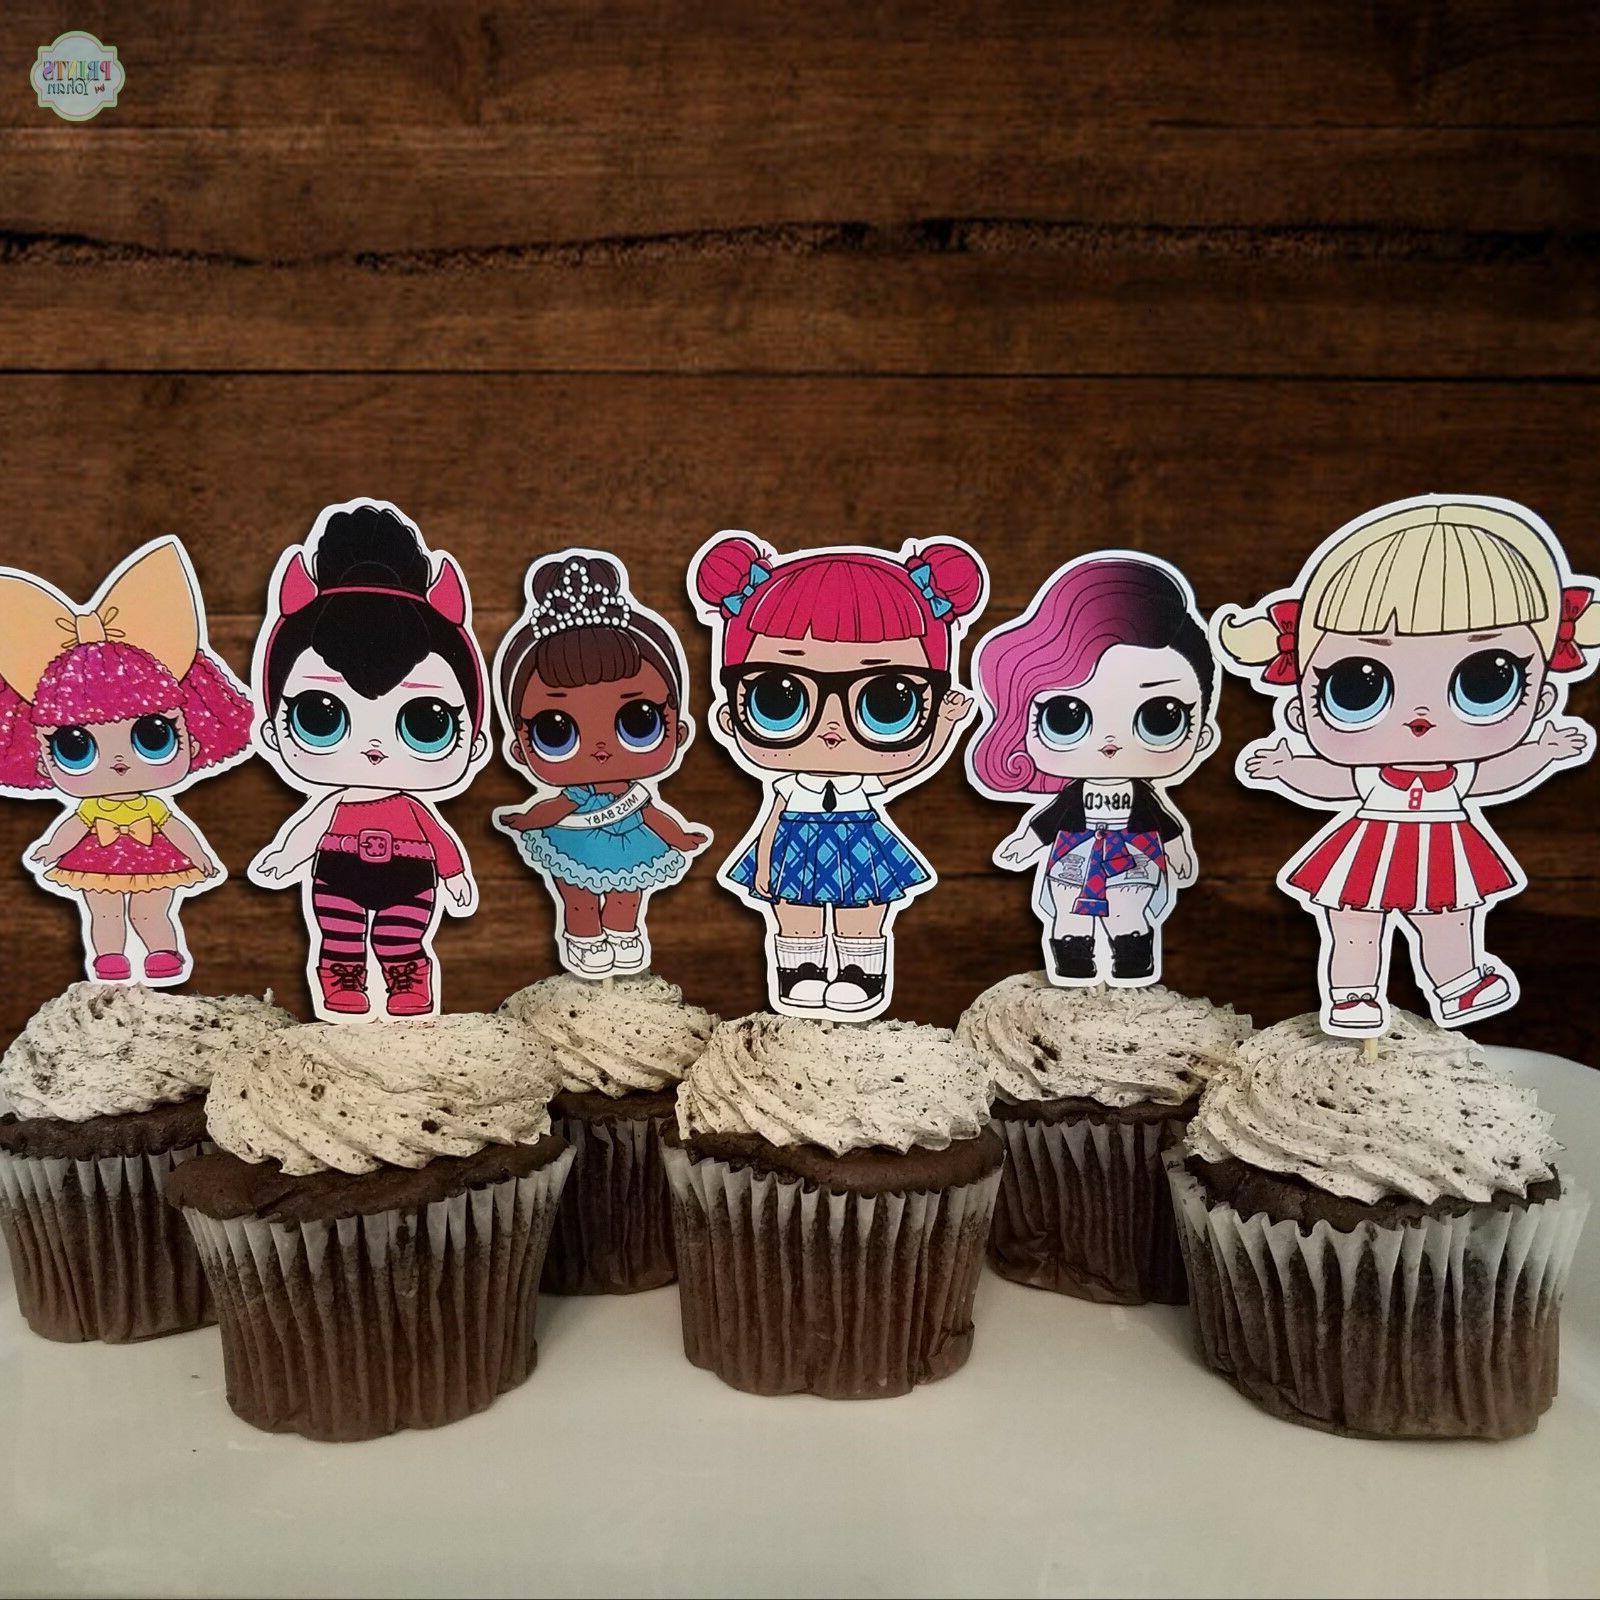 Set of 12 Surprise Cupcake Cupcake Decorations